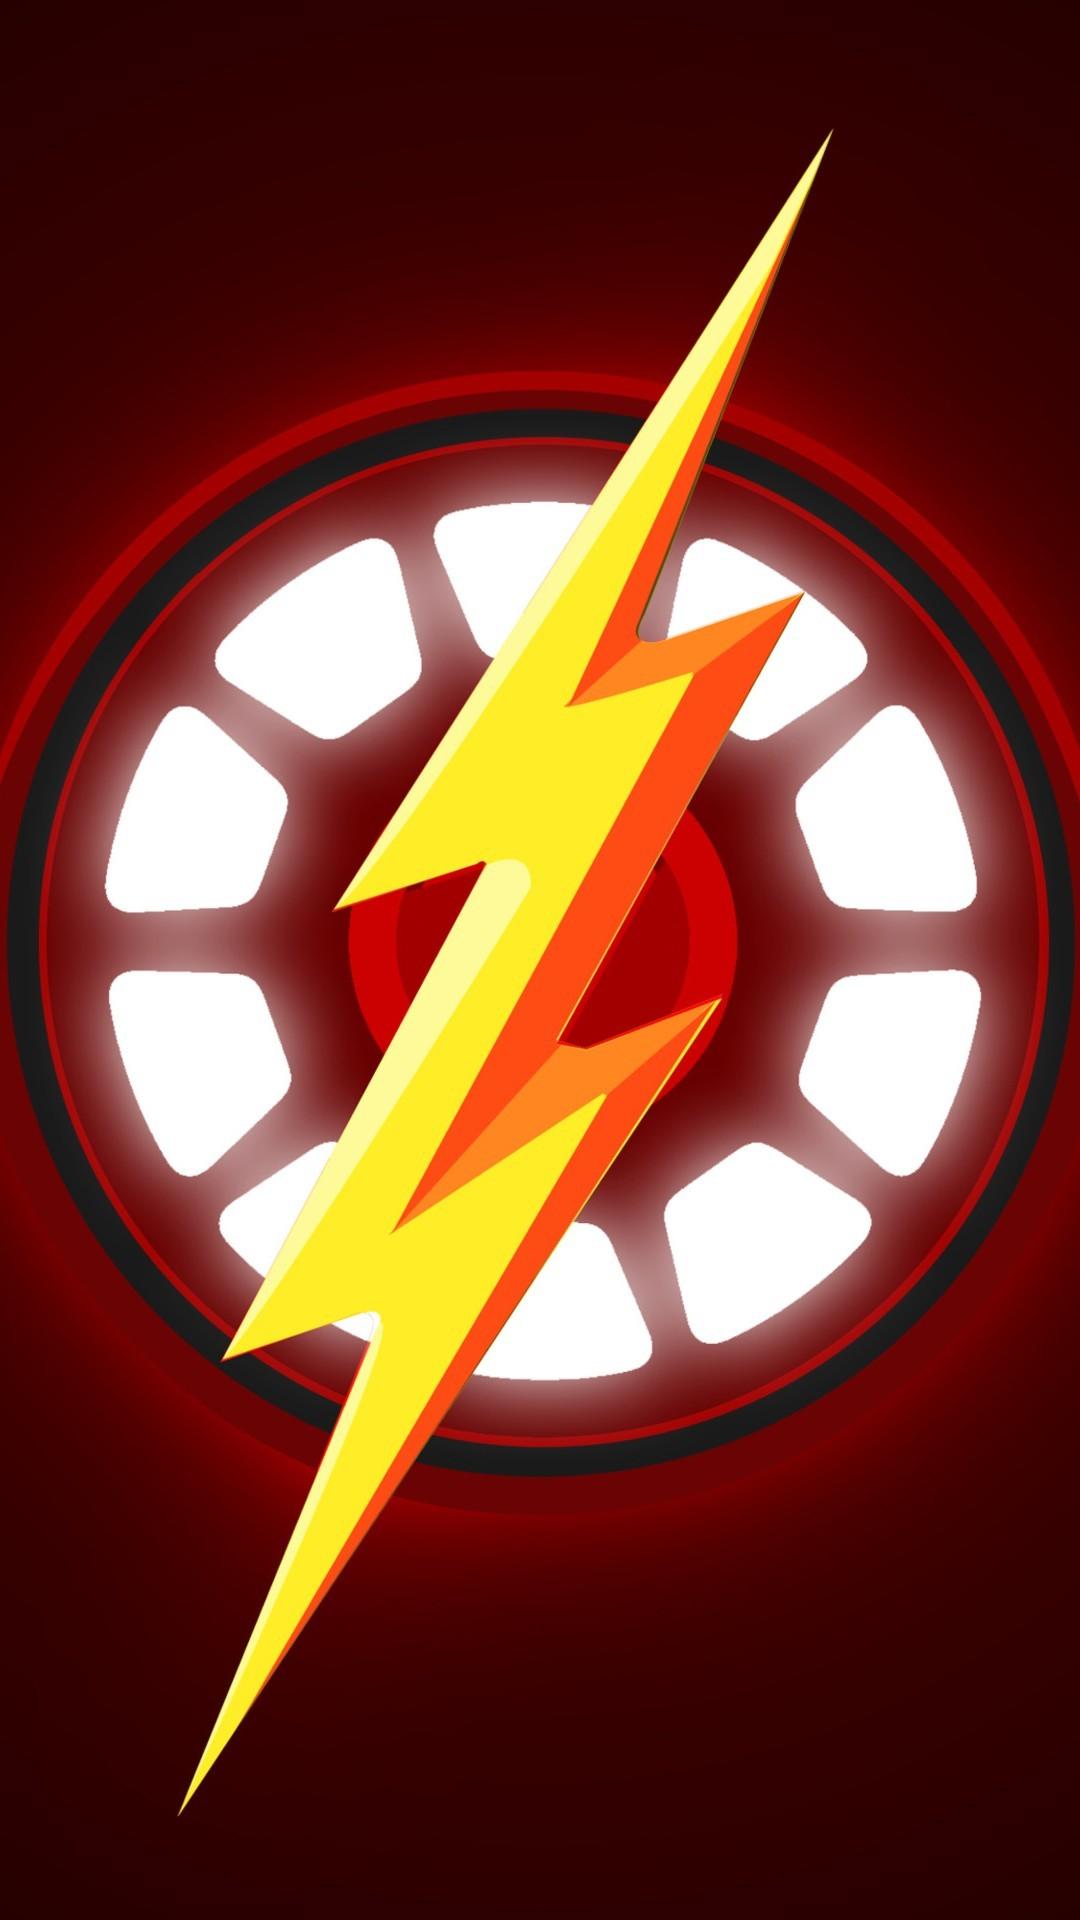 Free Iron Man The Flash phone wallpaper by kimberlyrae619